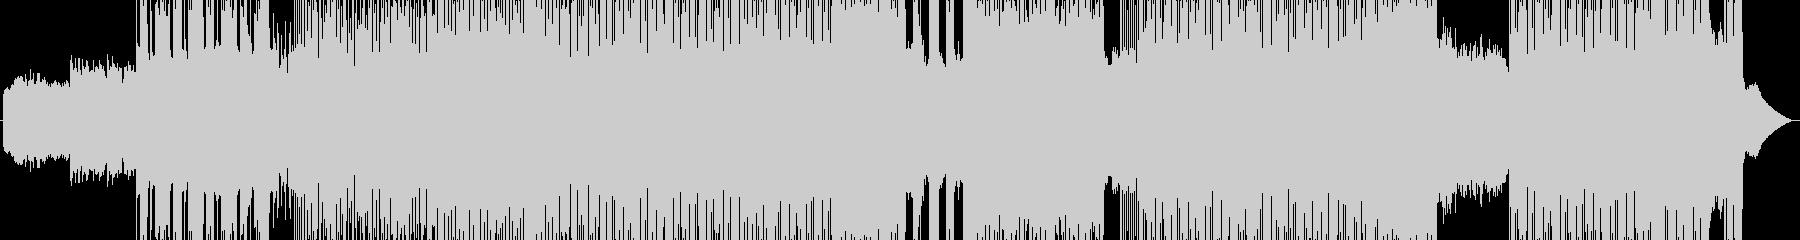 「HR/HM」「DARK系」BGM26の未再生の波形